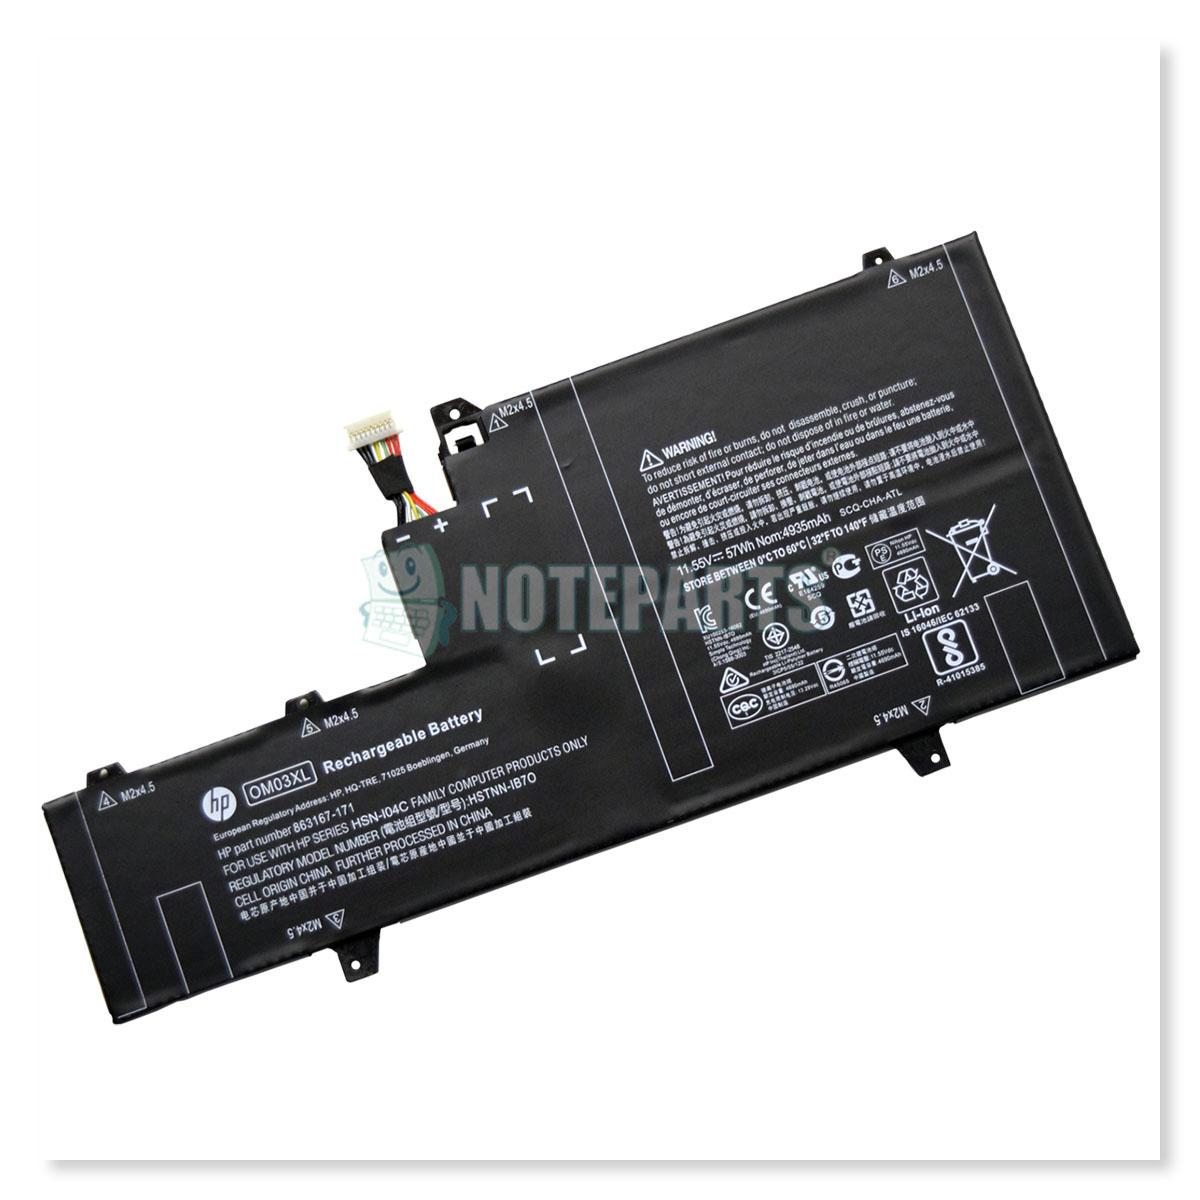 HP純正 EliteBook x360 1030 G2 バッテリー 863167-171 863280-855 OM03XL